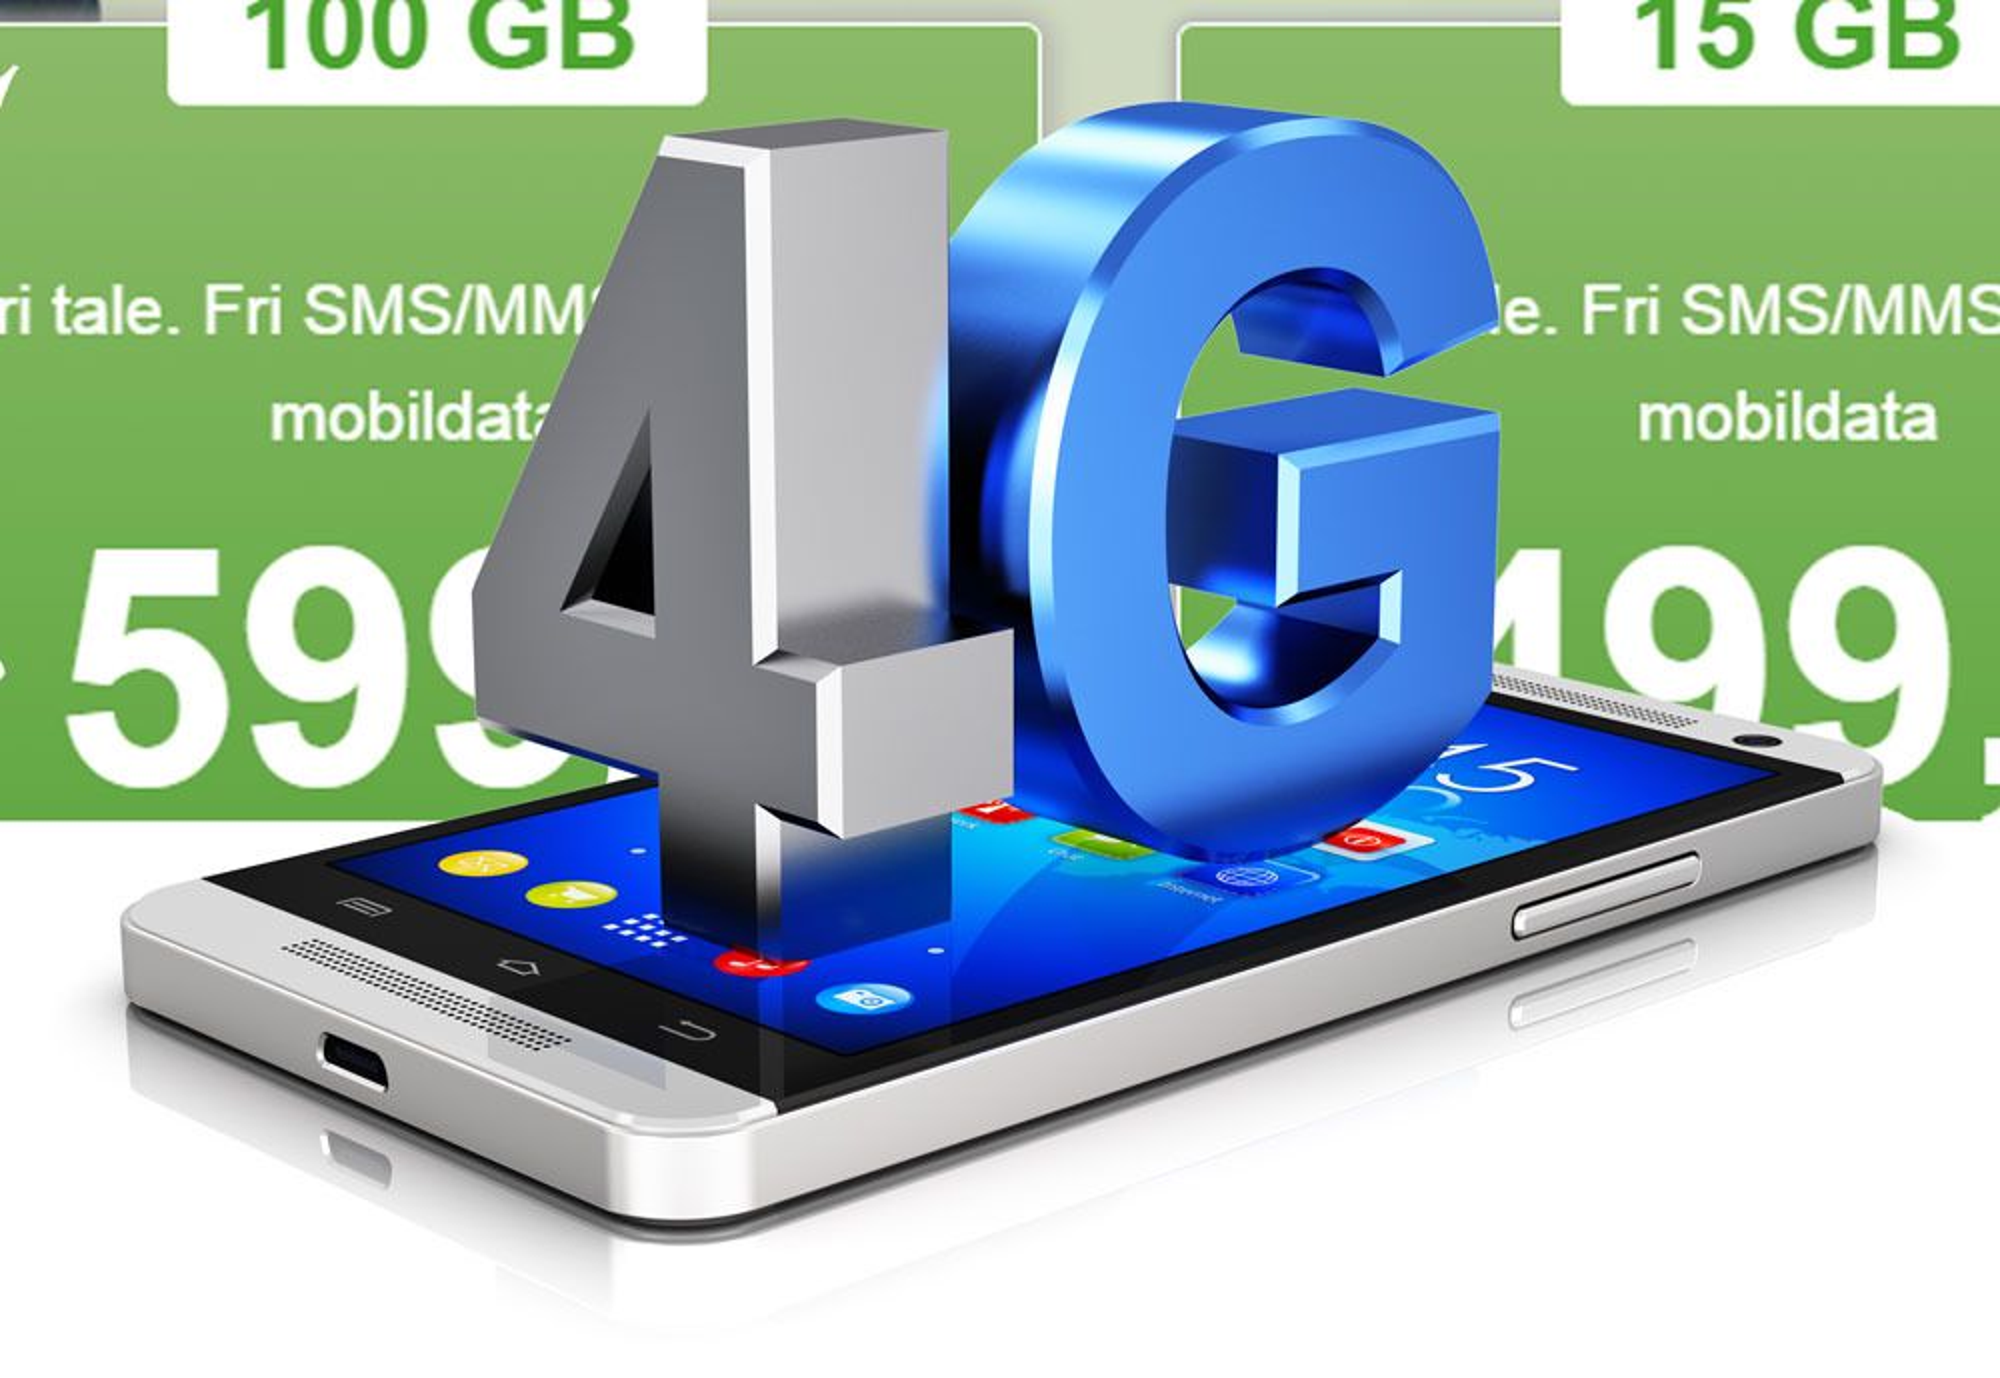 TEST: Slik er Banzais mobile bredbånd